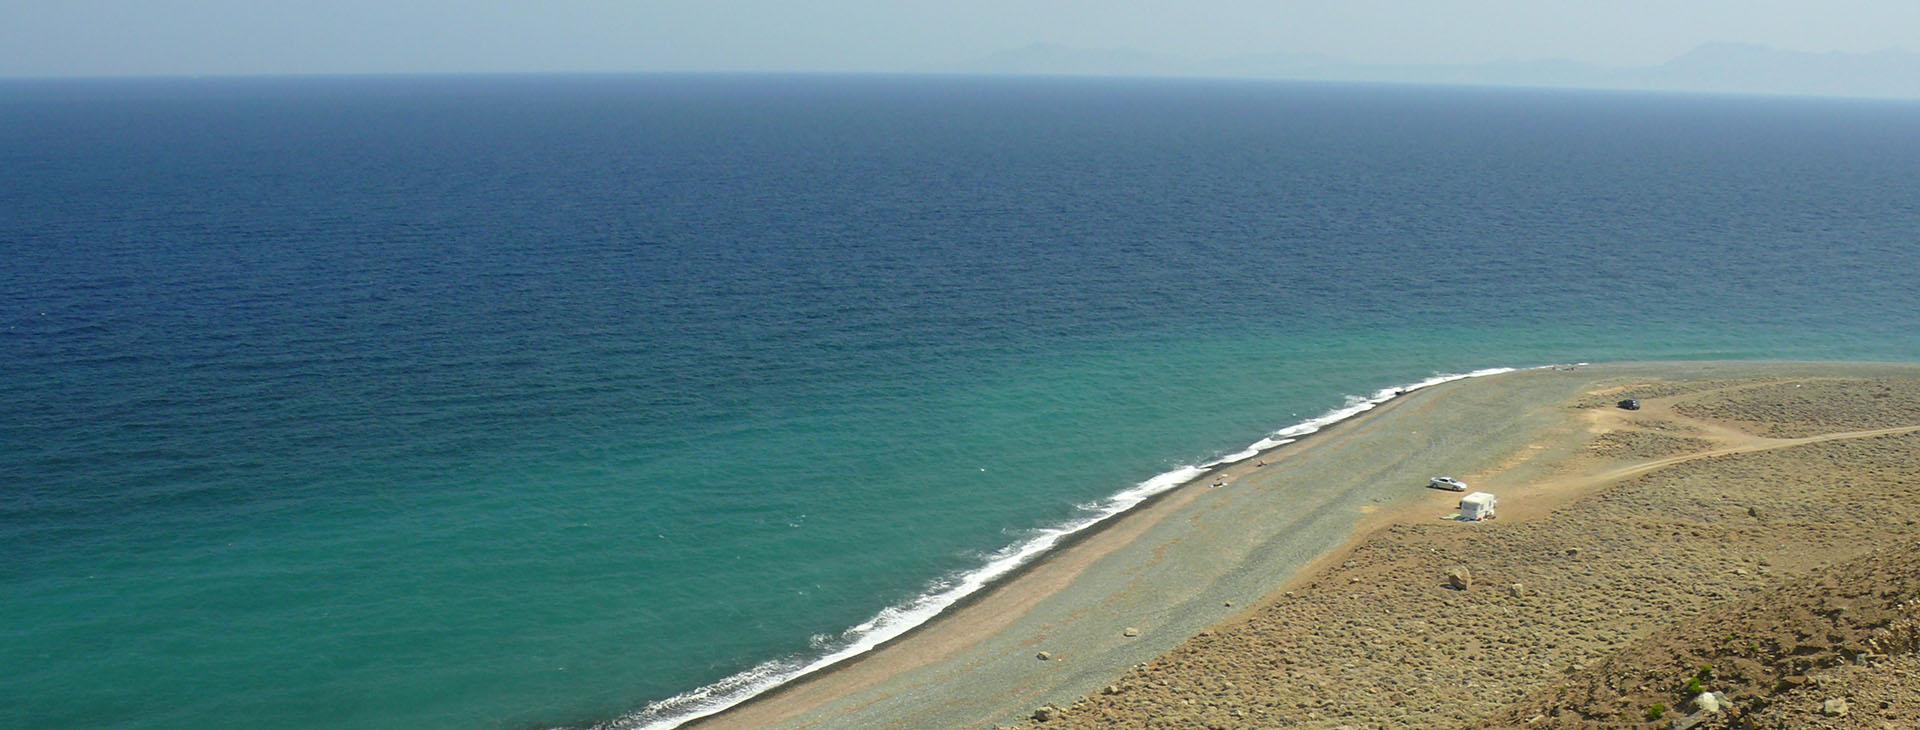 Beach at Samothrace island